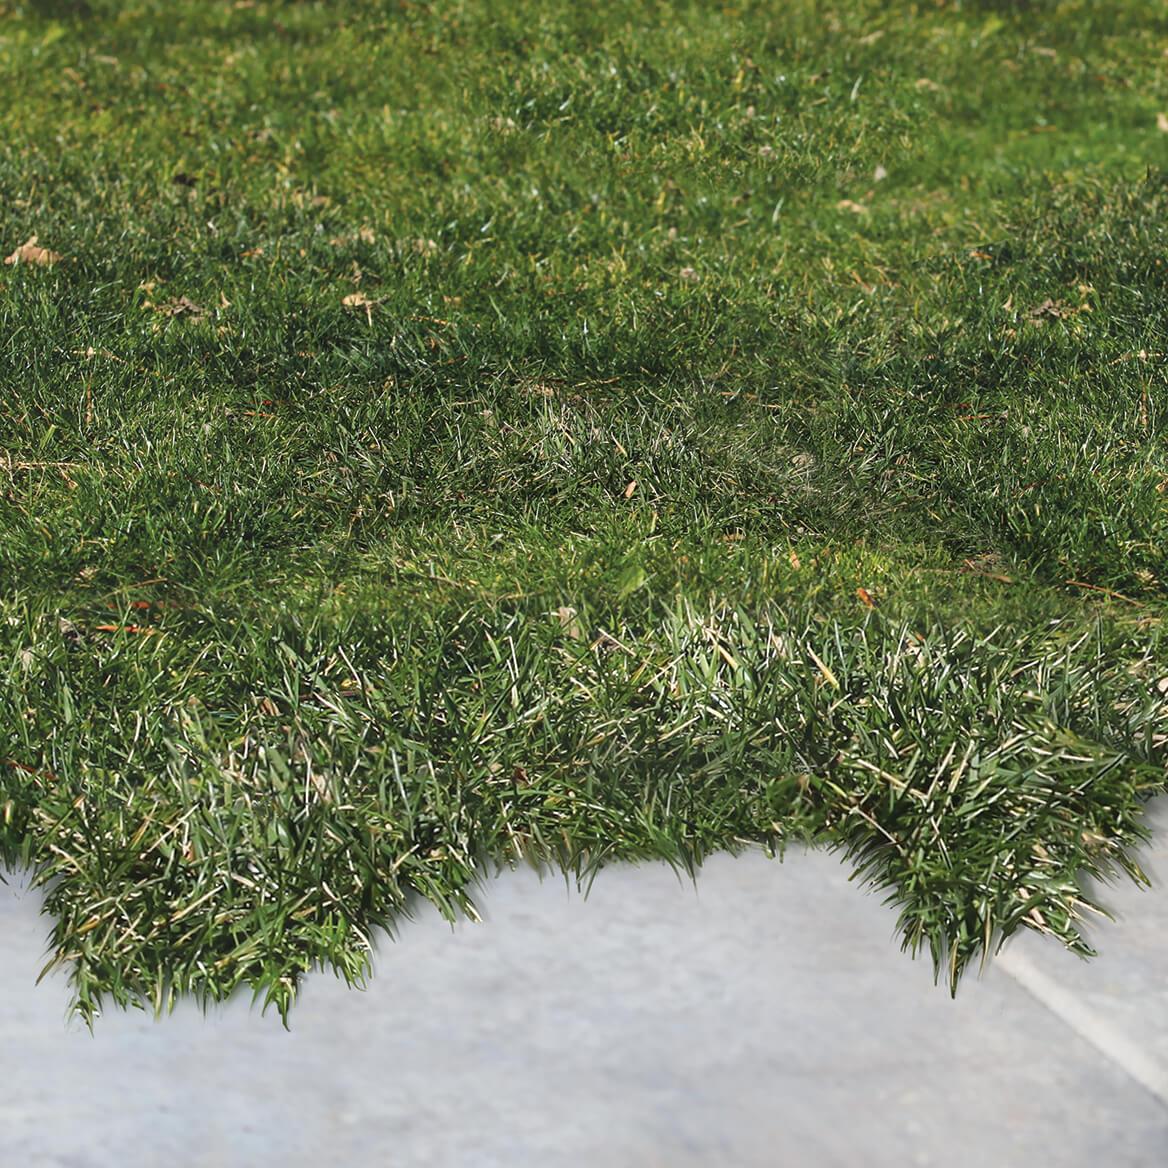 Garden Pro Landscape Edging-370236